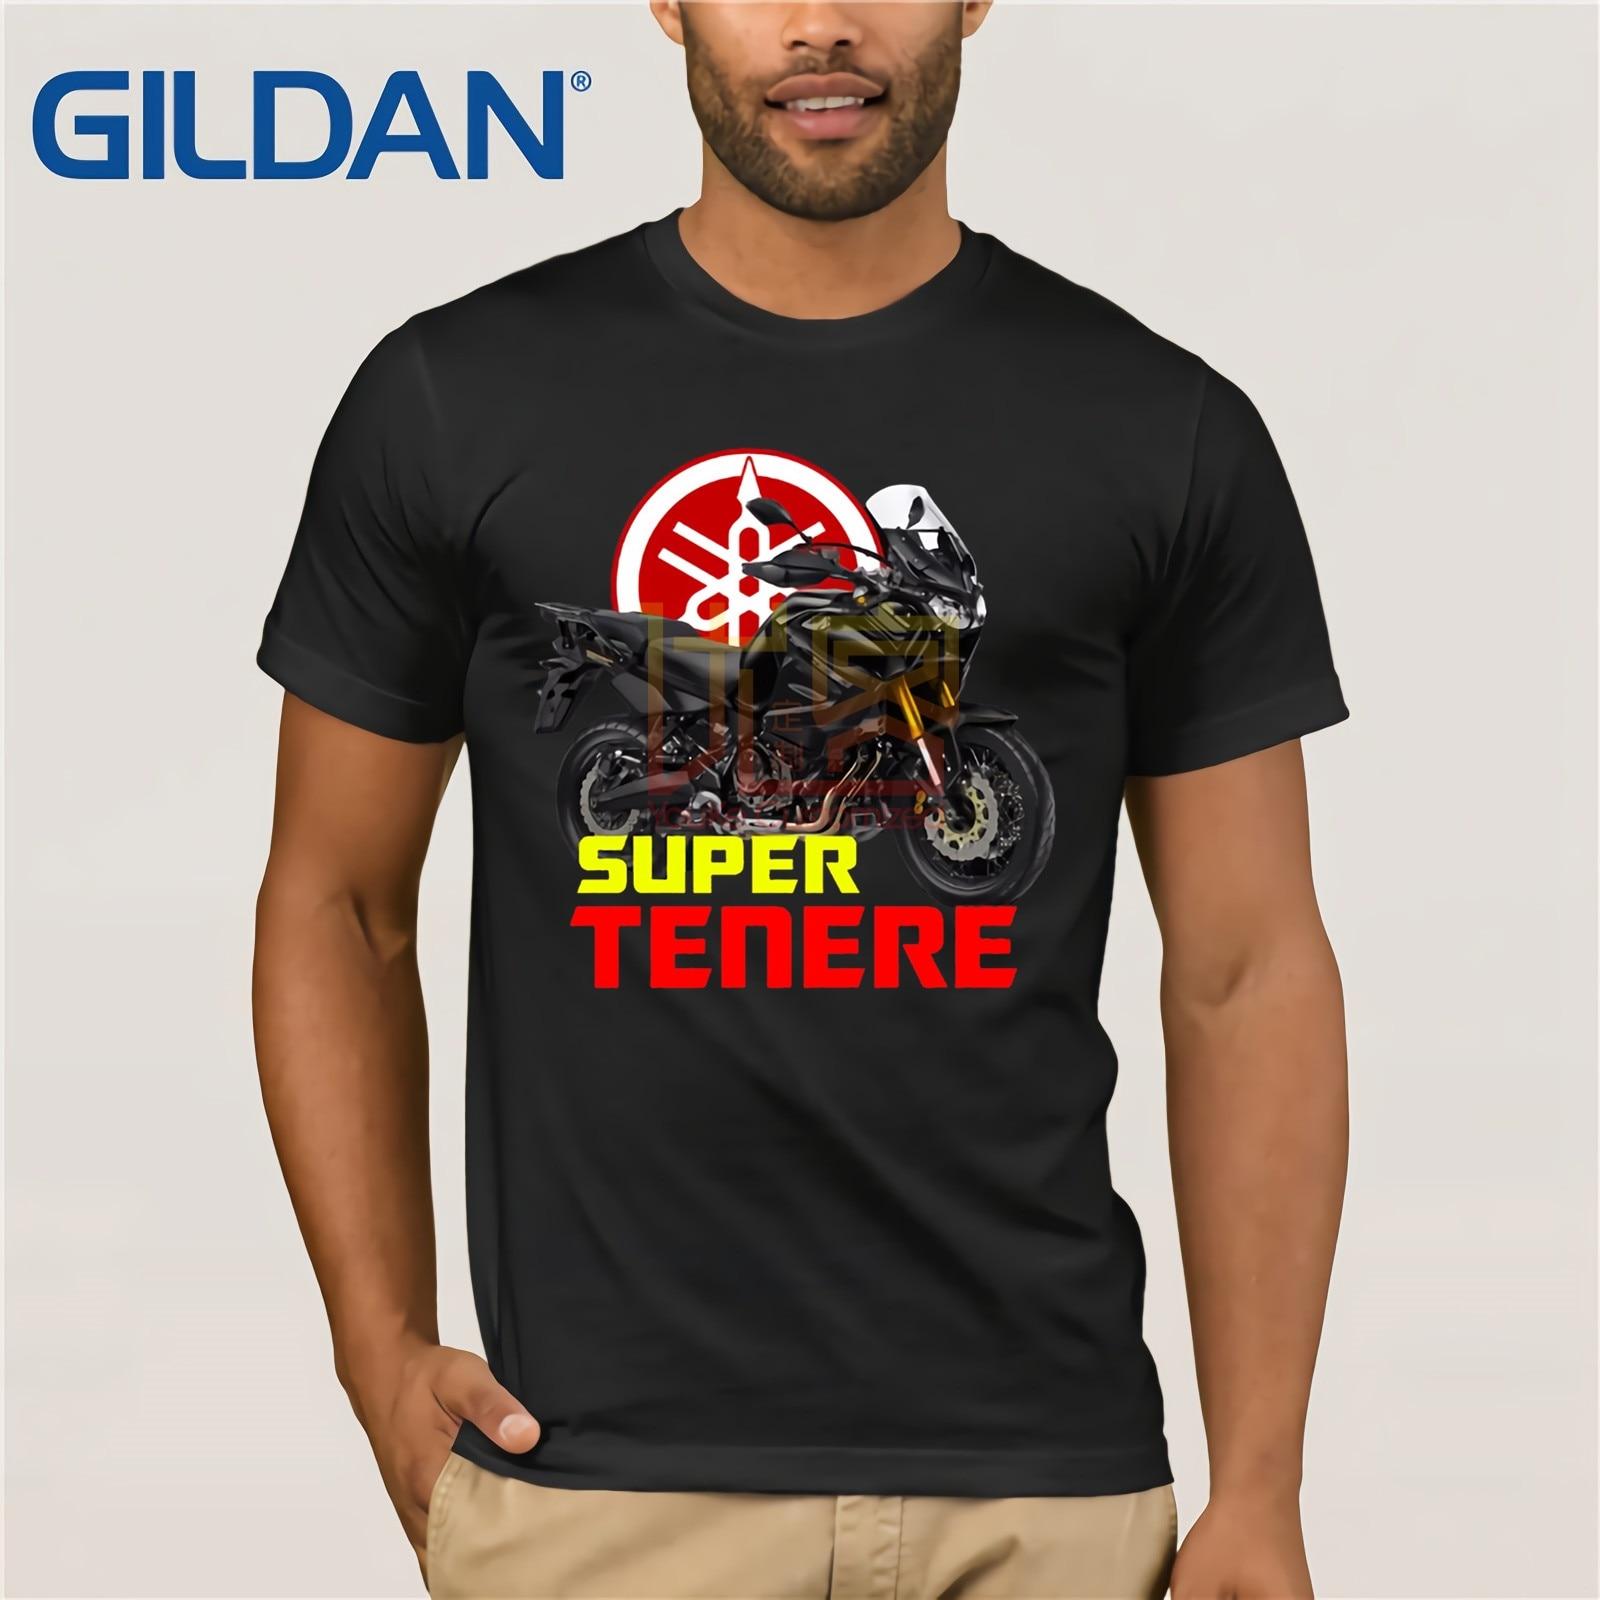 2019 100% Cotton Summer Mens Hot Sale T Shirt Super Tenere T-Shirt Xtz 1200 Super Tenere Tee Shirt